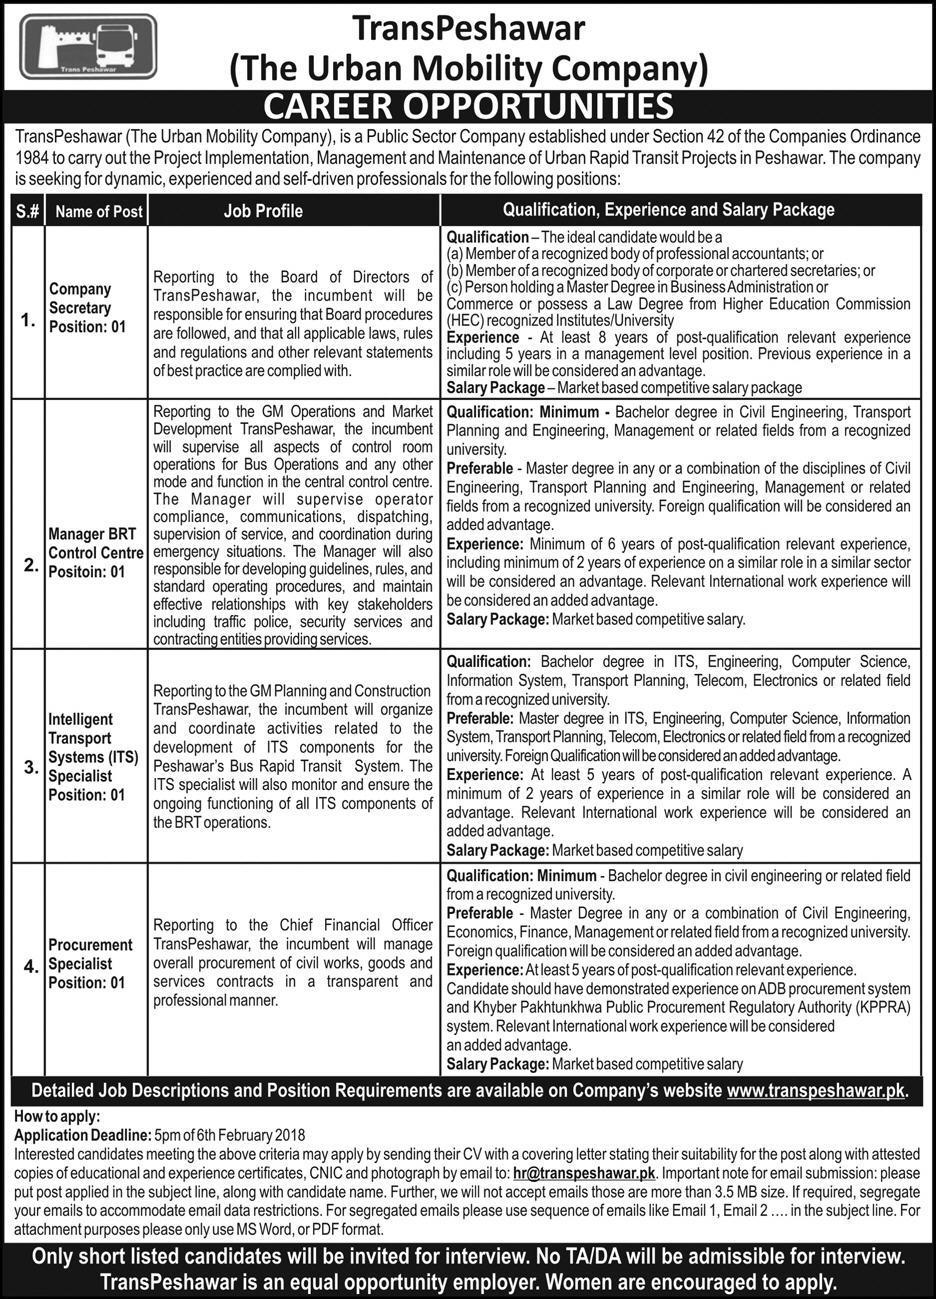 Jobs In Transpeshawar The Urban Mobillity Company January 2018